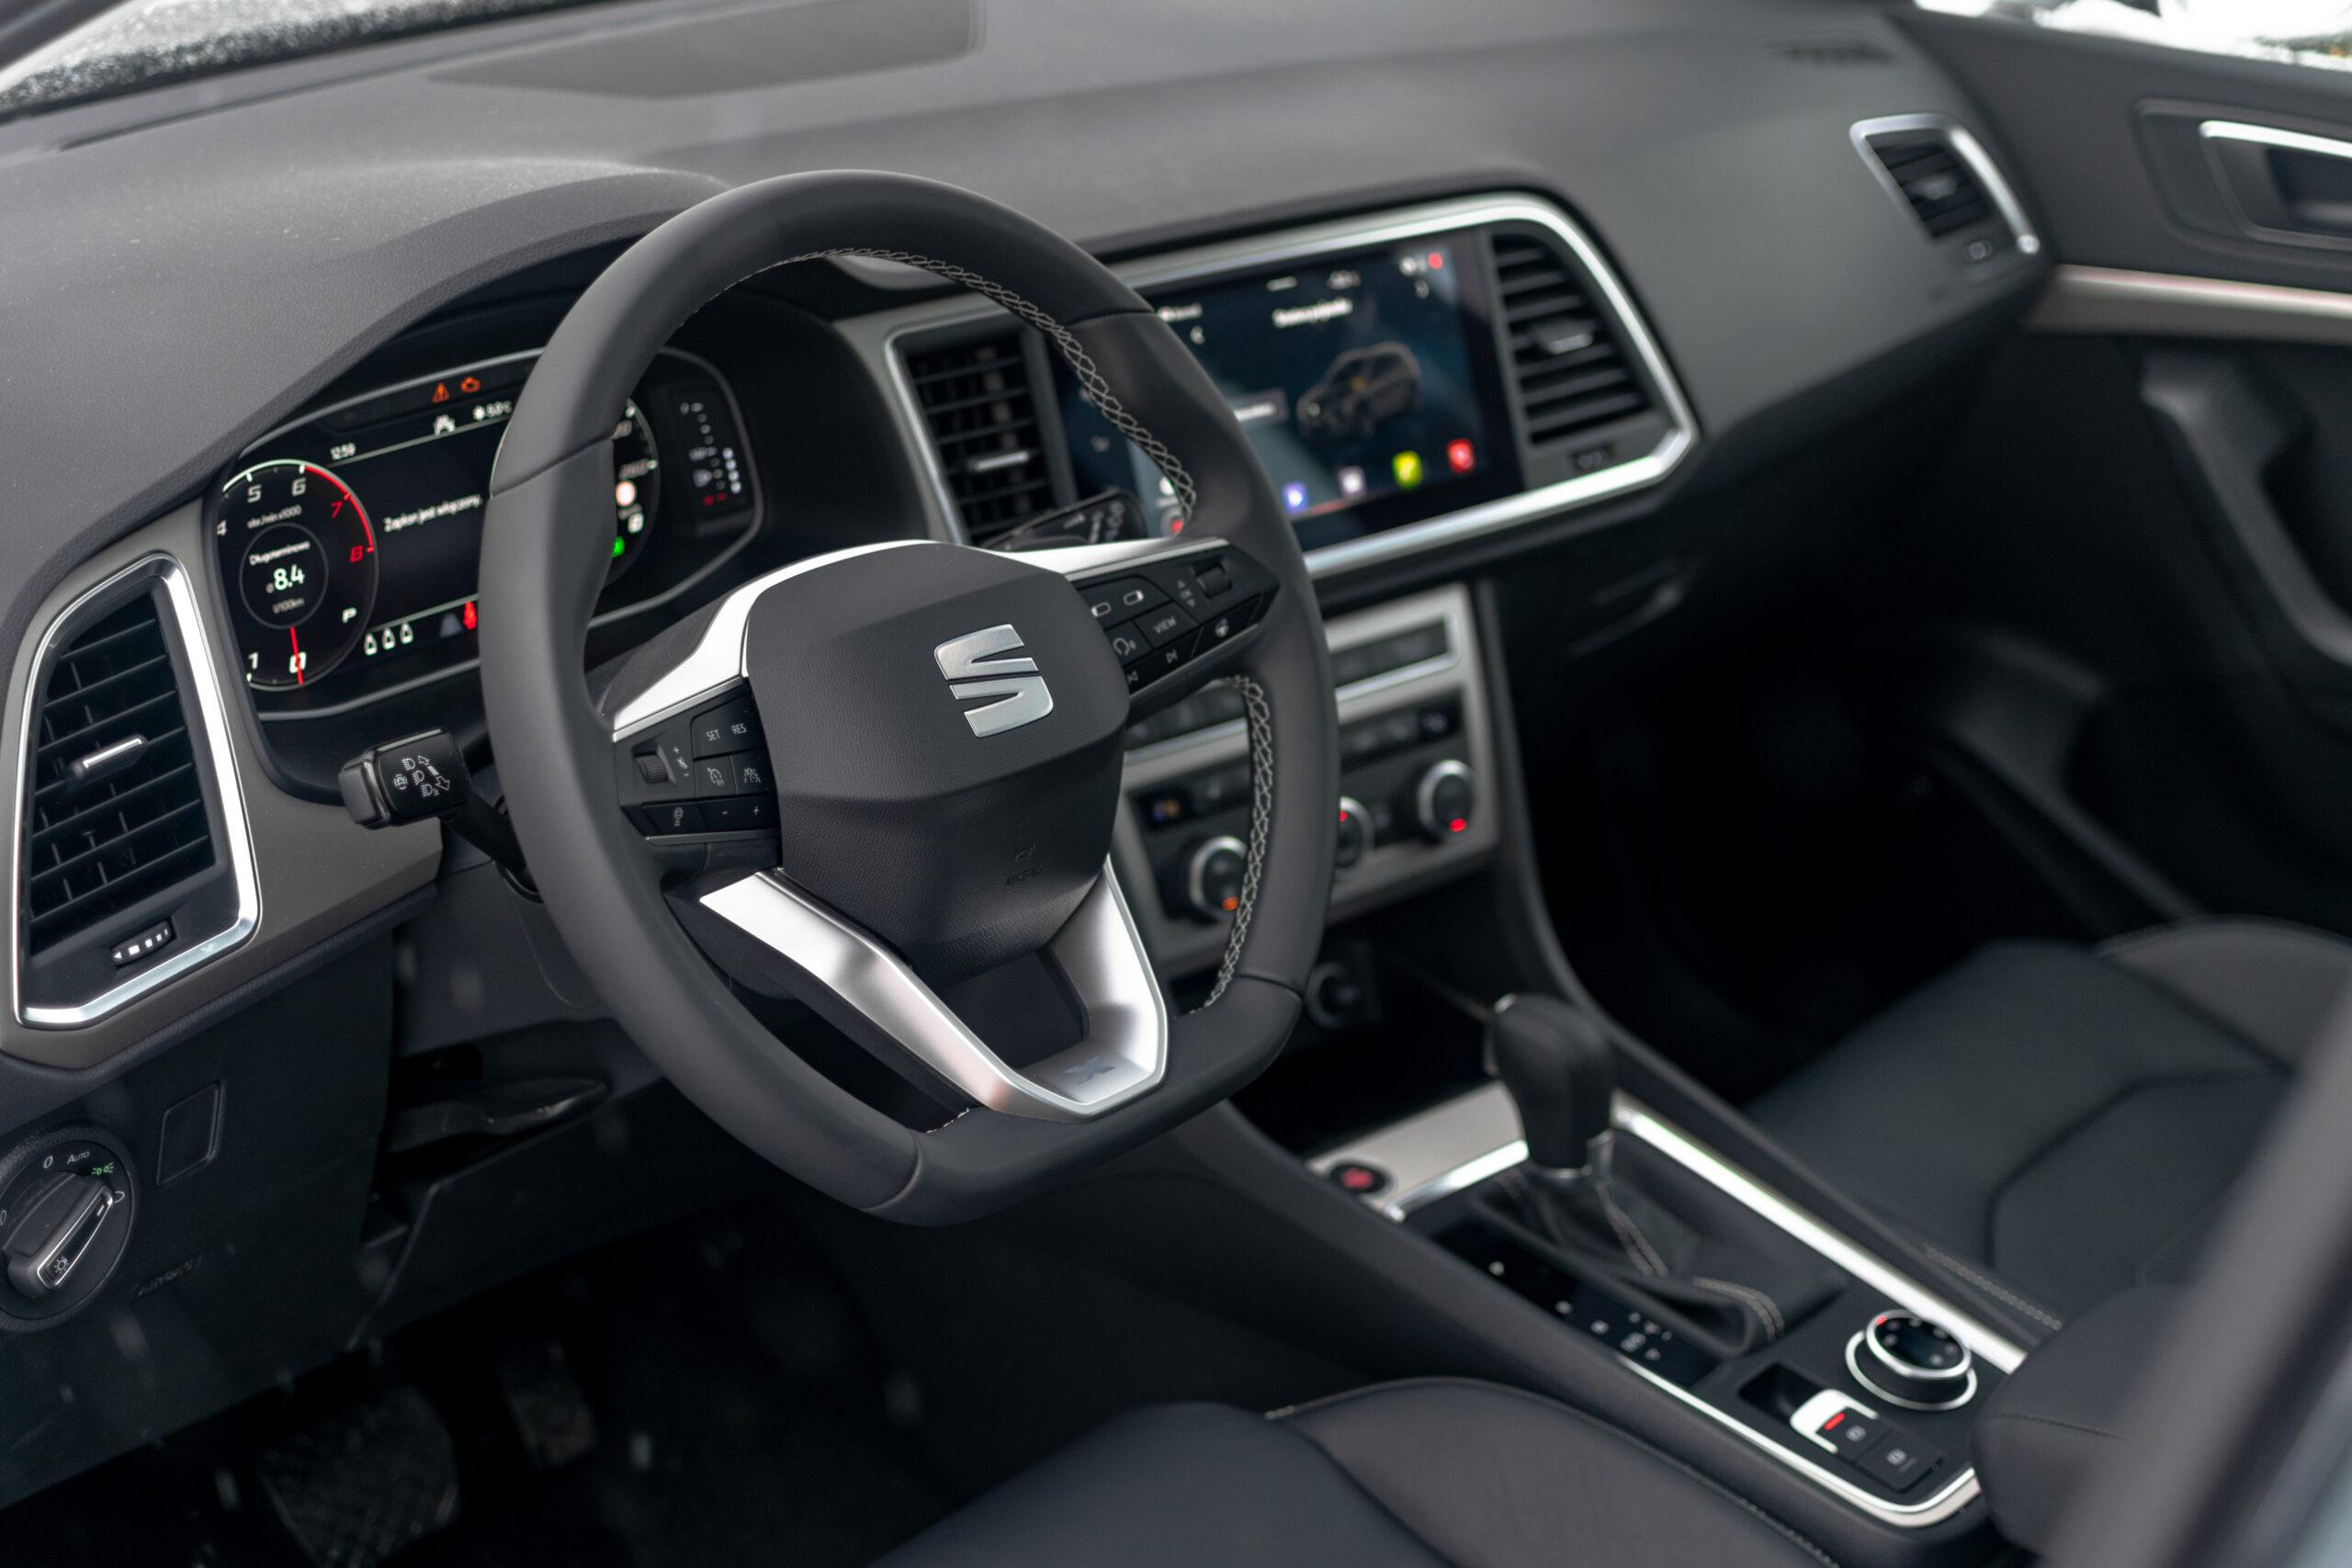 SEAT Ateca 2.0 TSI 190 DSG 4Drive X-PERIENCE